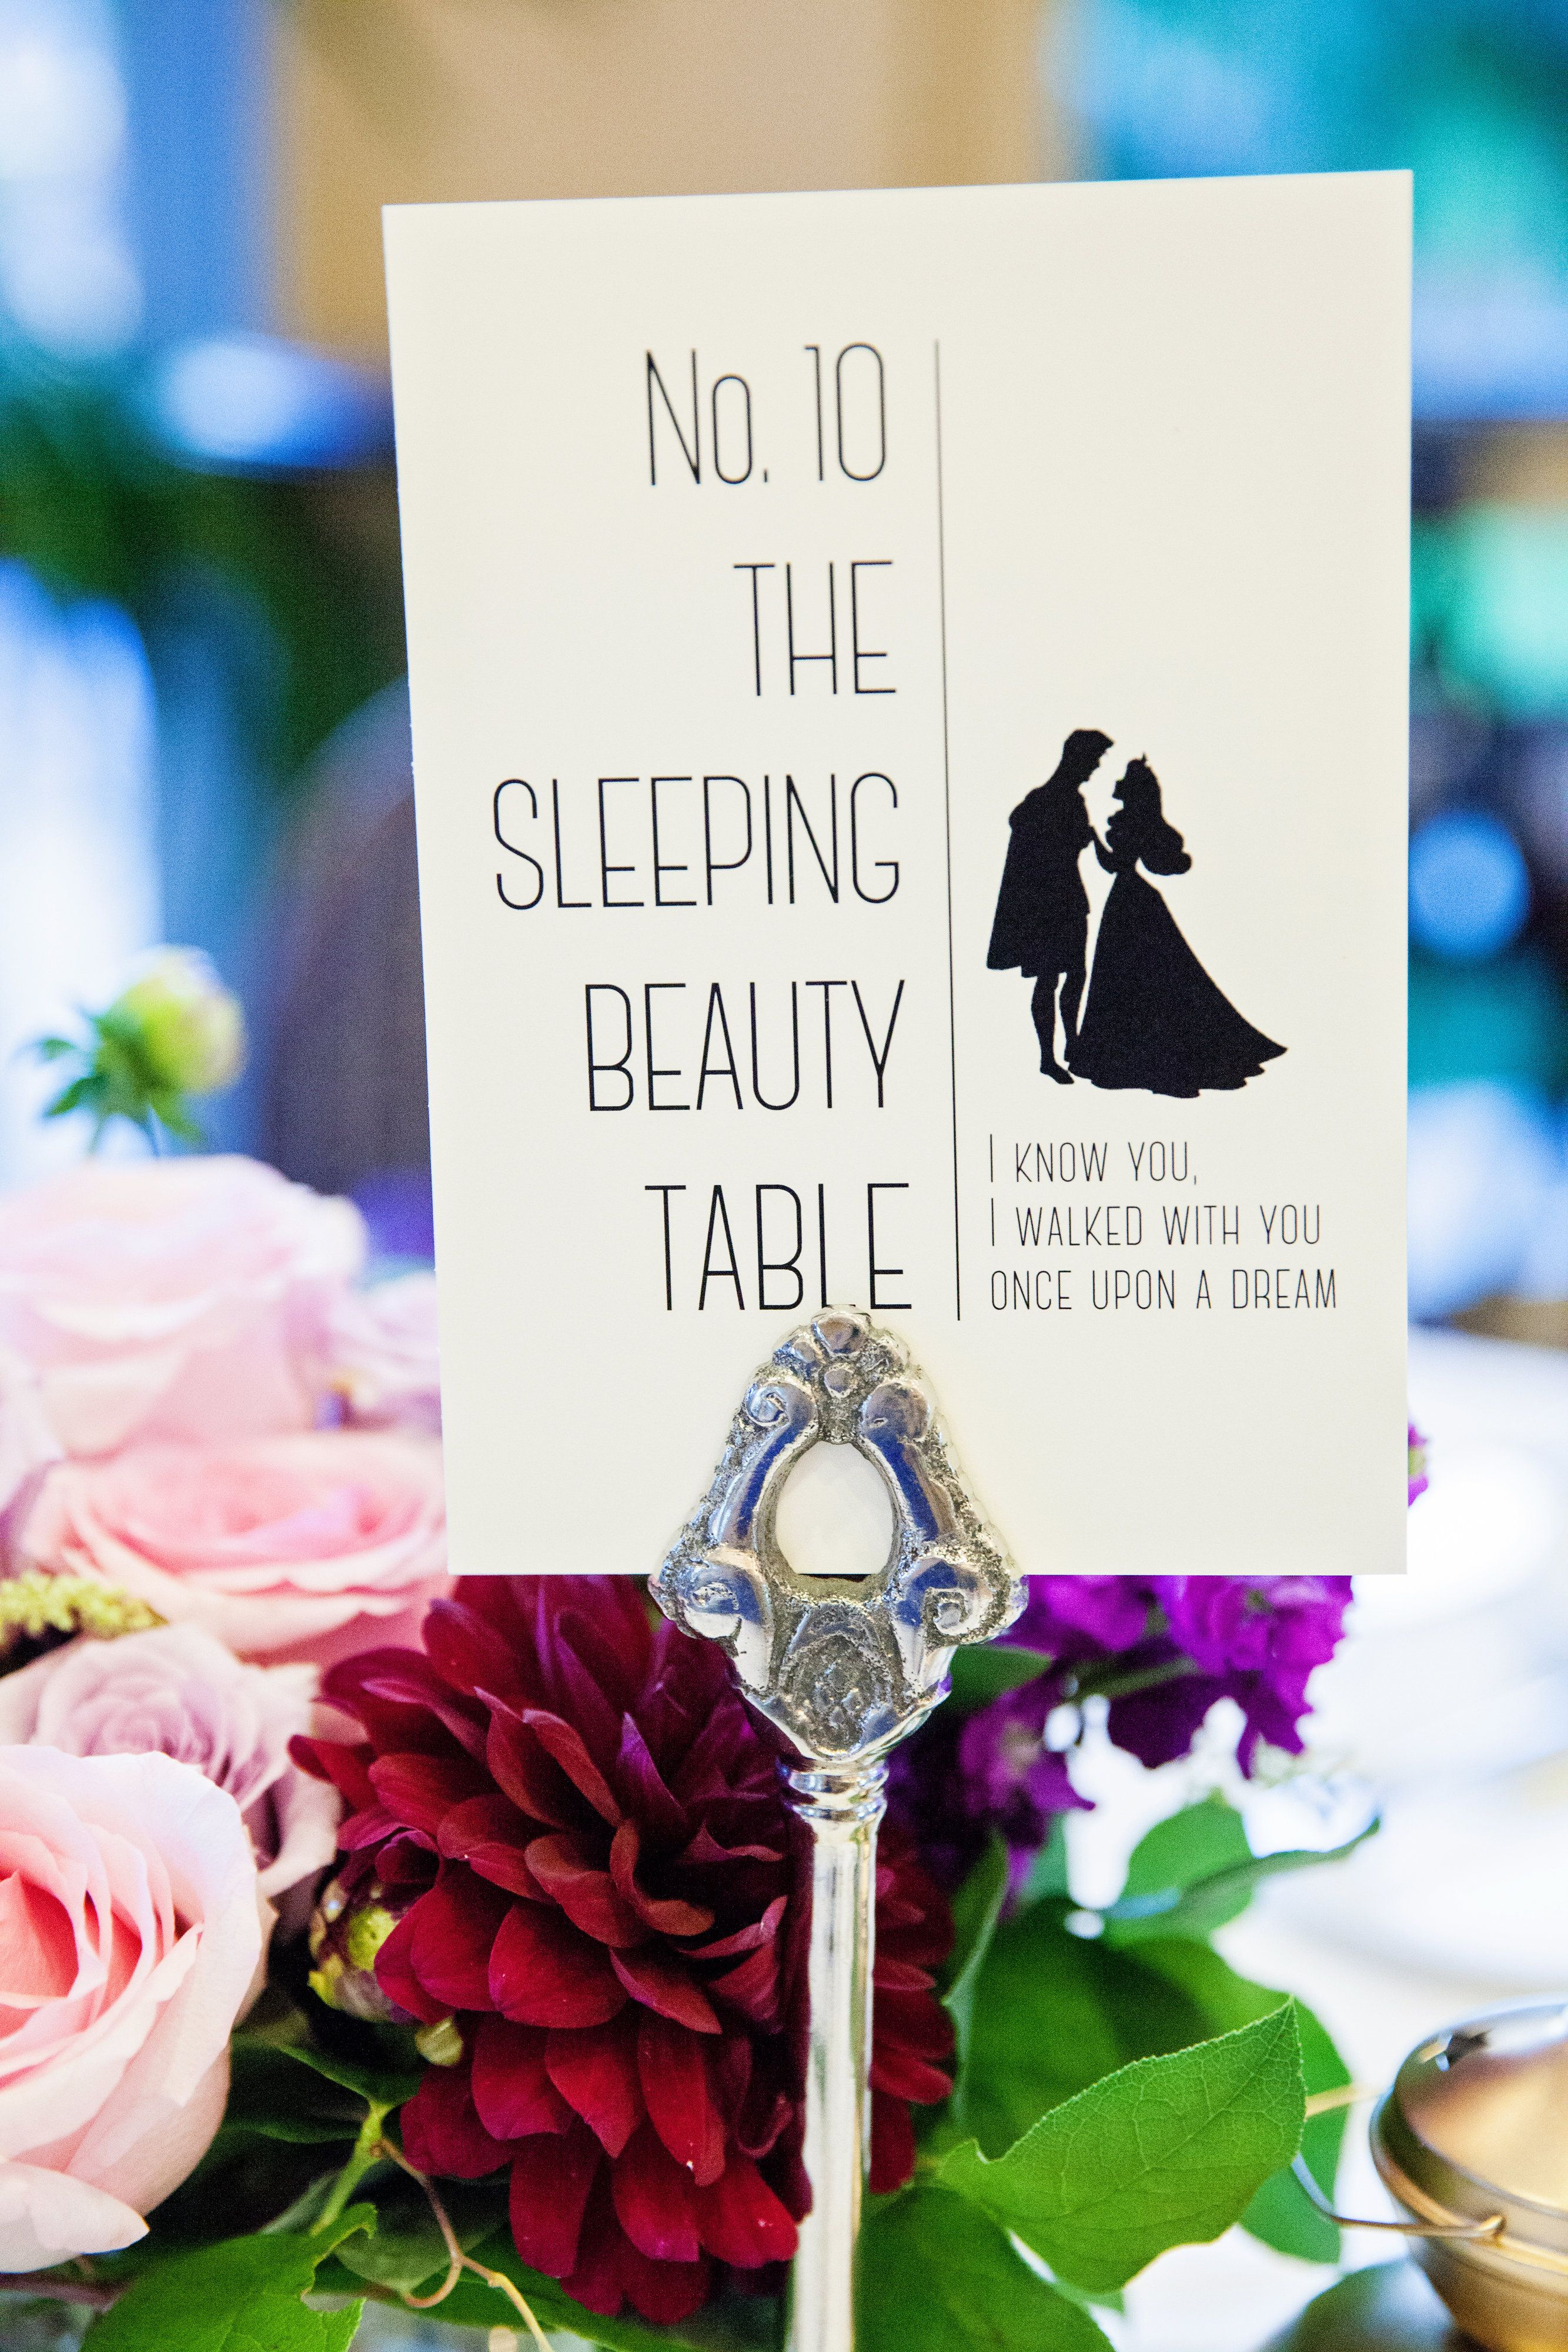 Disneyland photos disneyland paris bride groom table grooms table - Disney Prince And Princess Reception Table Cards With Gold Bow Decor Pinterest Disney Princes Table Cards And Princess